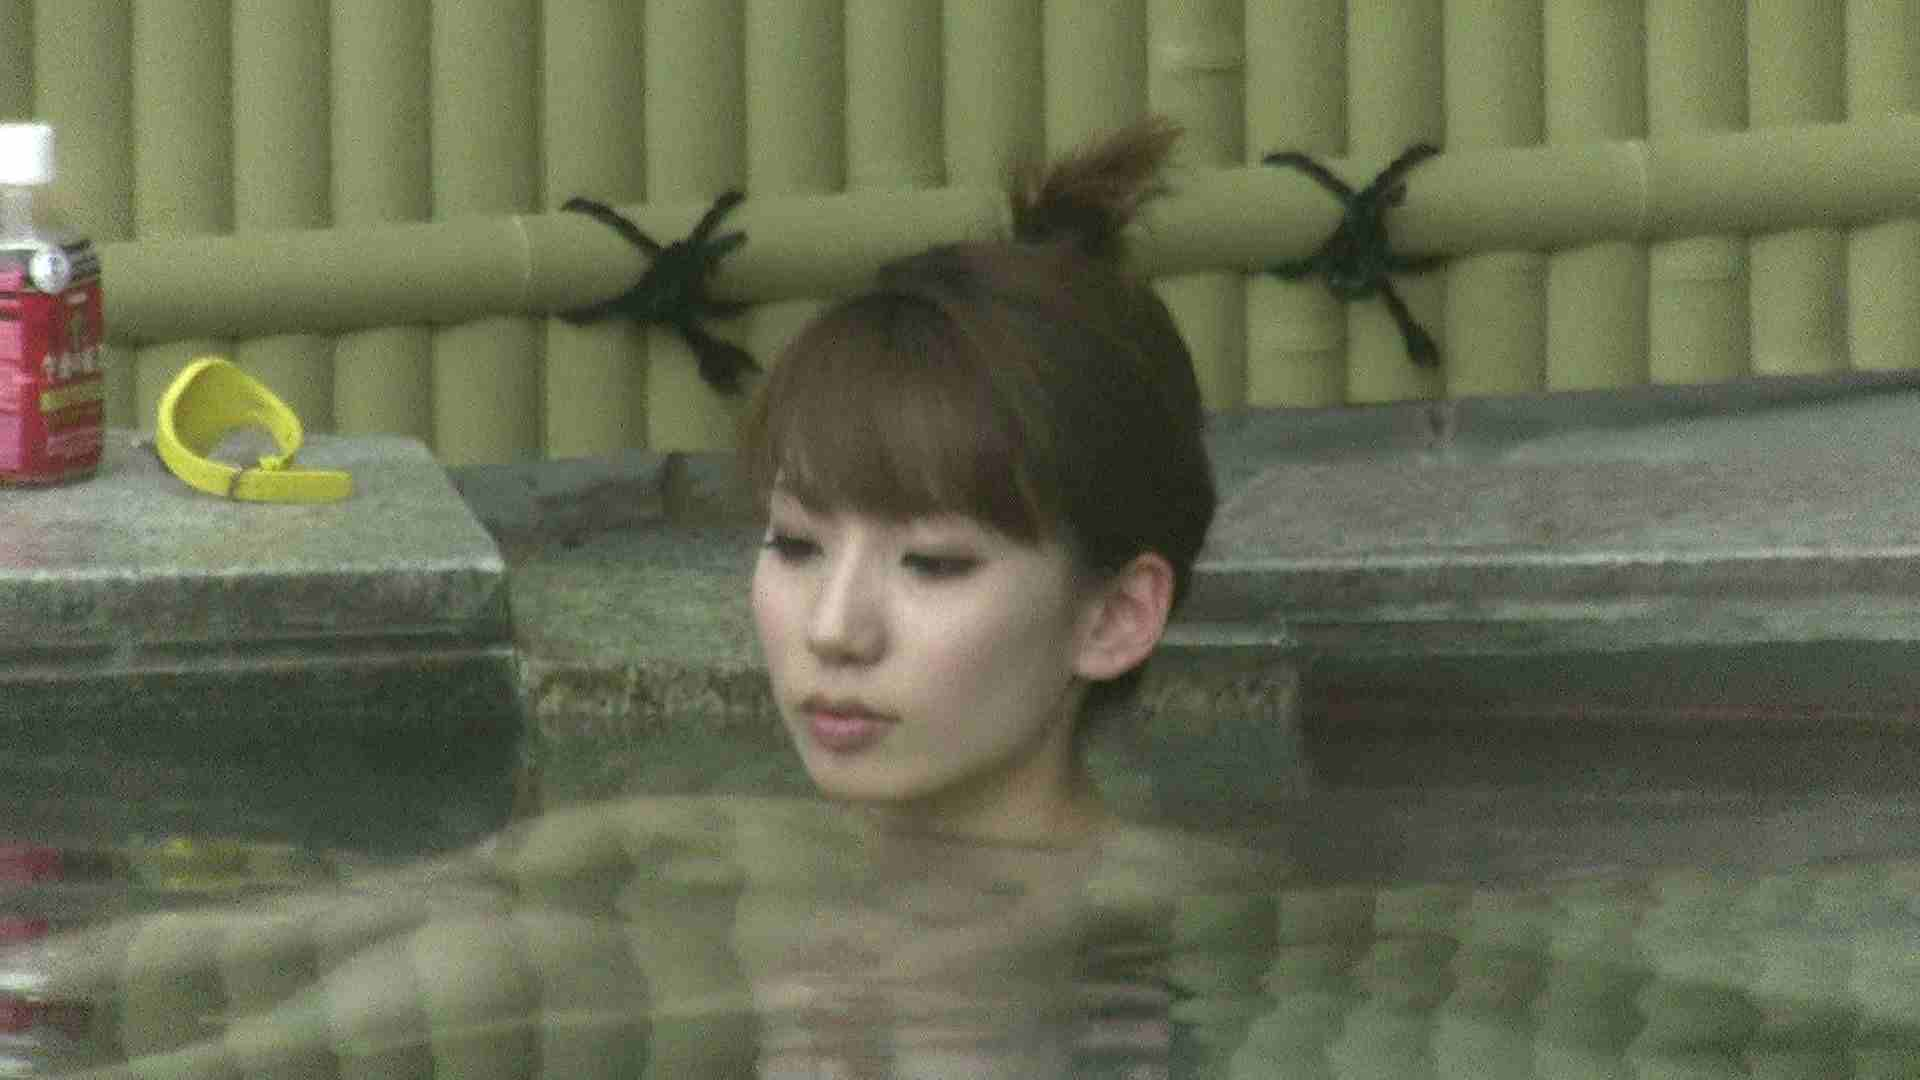 Aquaな露天風呂Vol.208 0 | 0  78連発 33